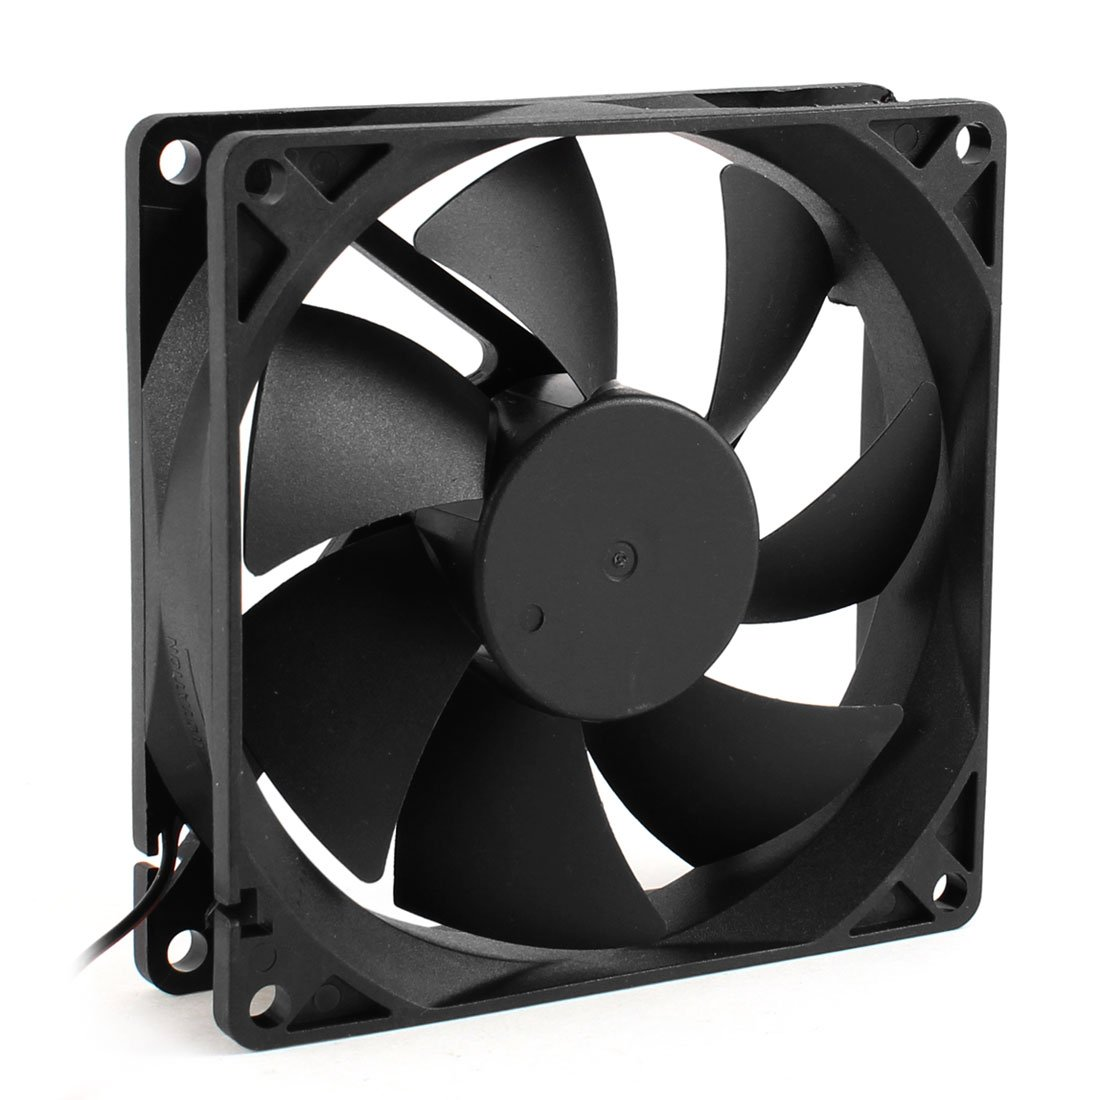 CAA Hot 92mm x 25mm 24V 2Pin Sleeve Bearing Cooling Fan for PC Case CPU Cooler lego звездные войны пробуждение силы [xbox 360]